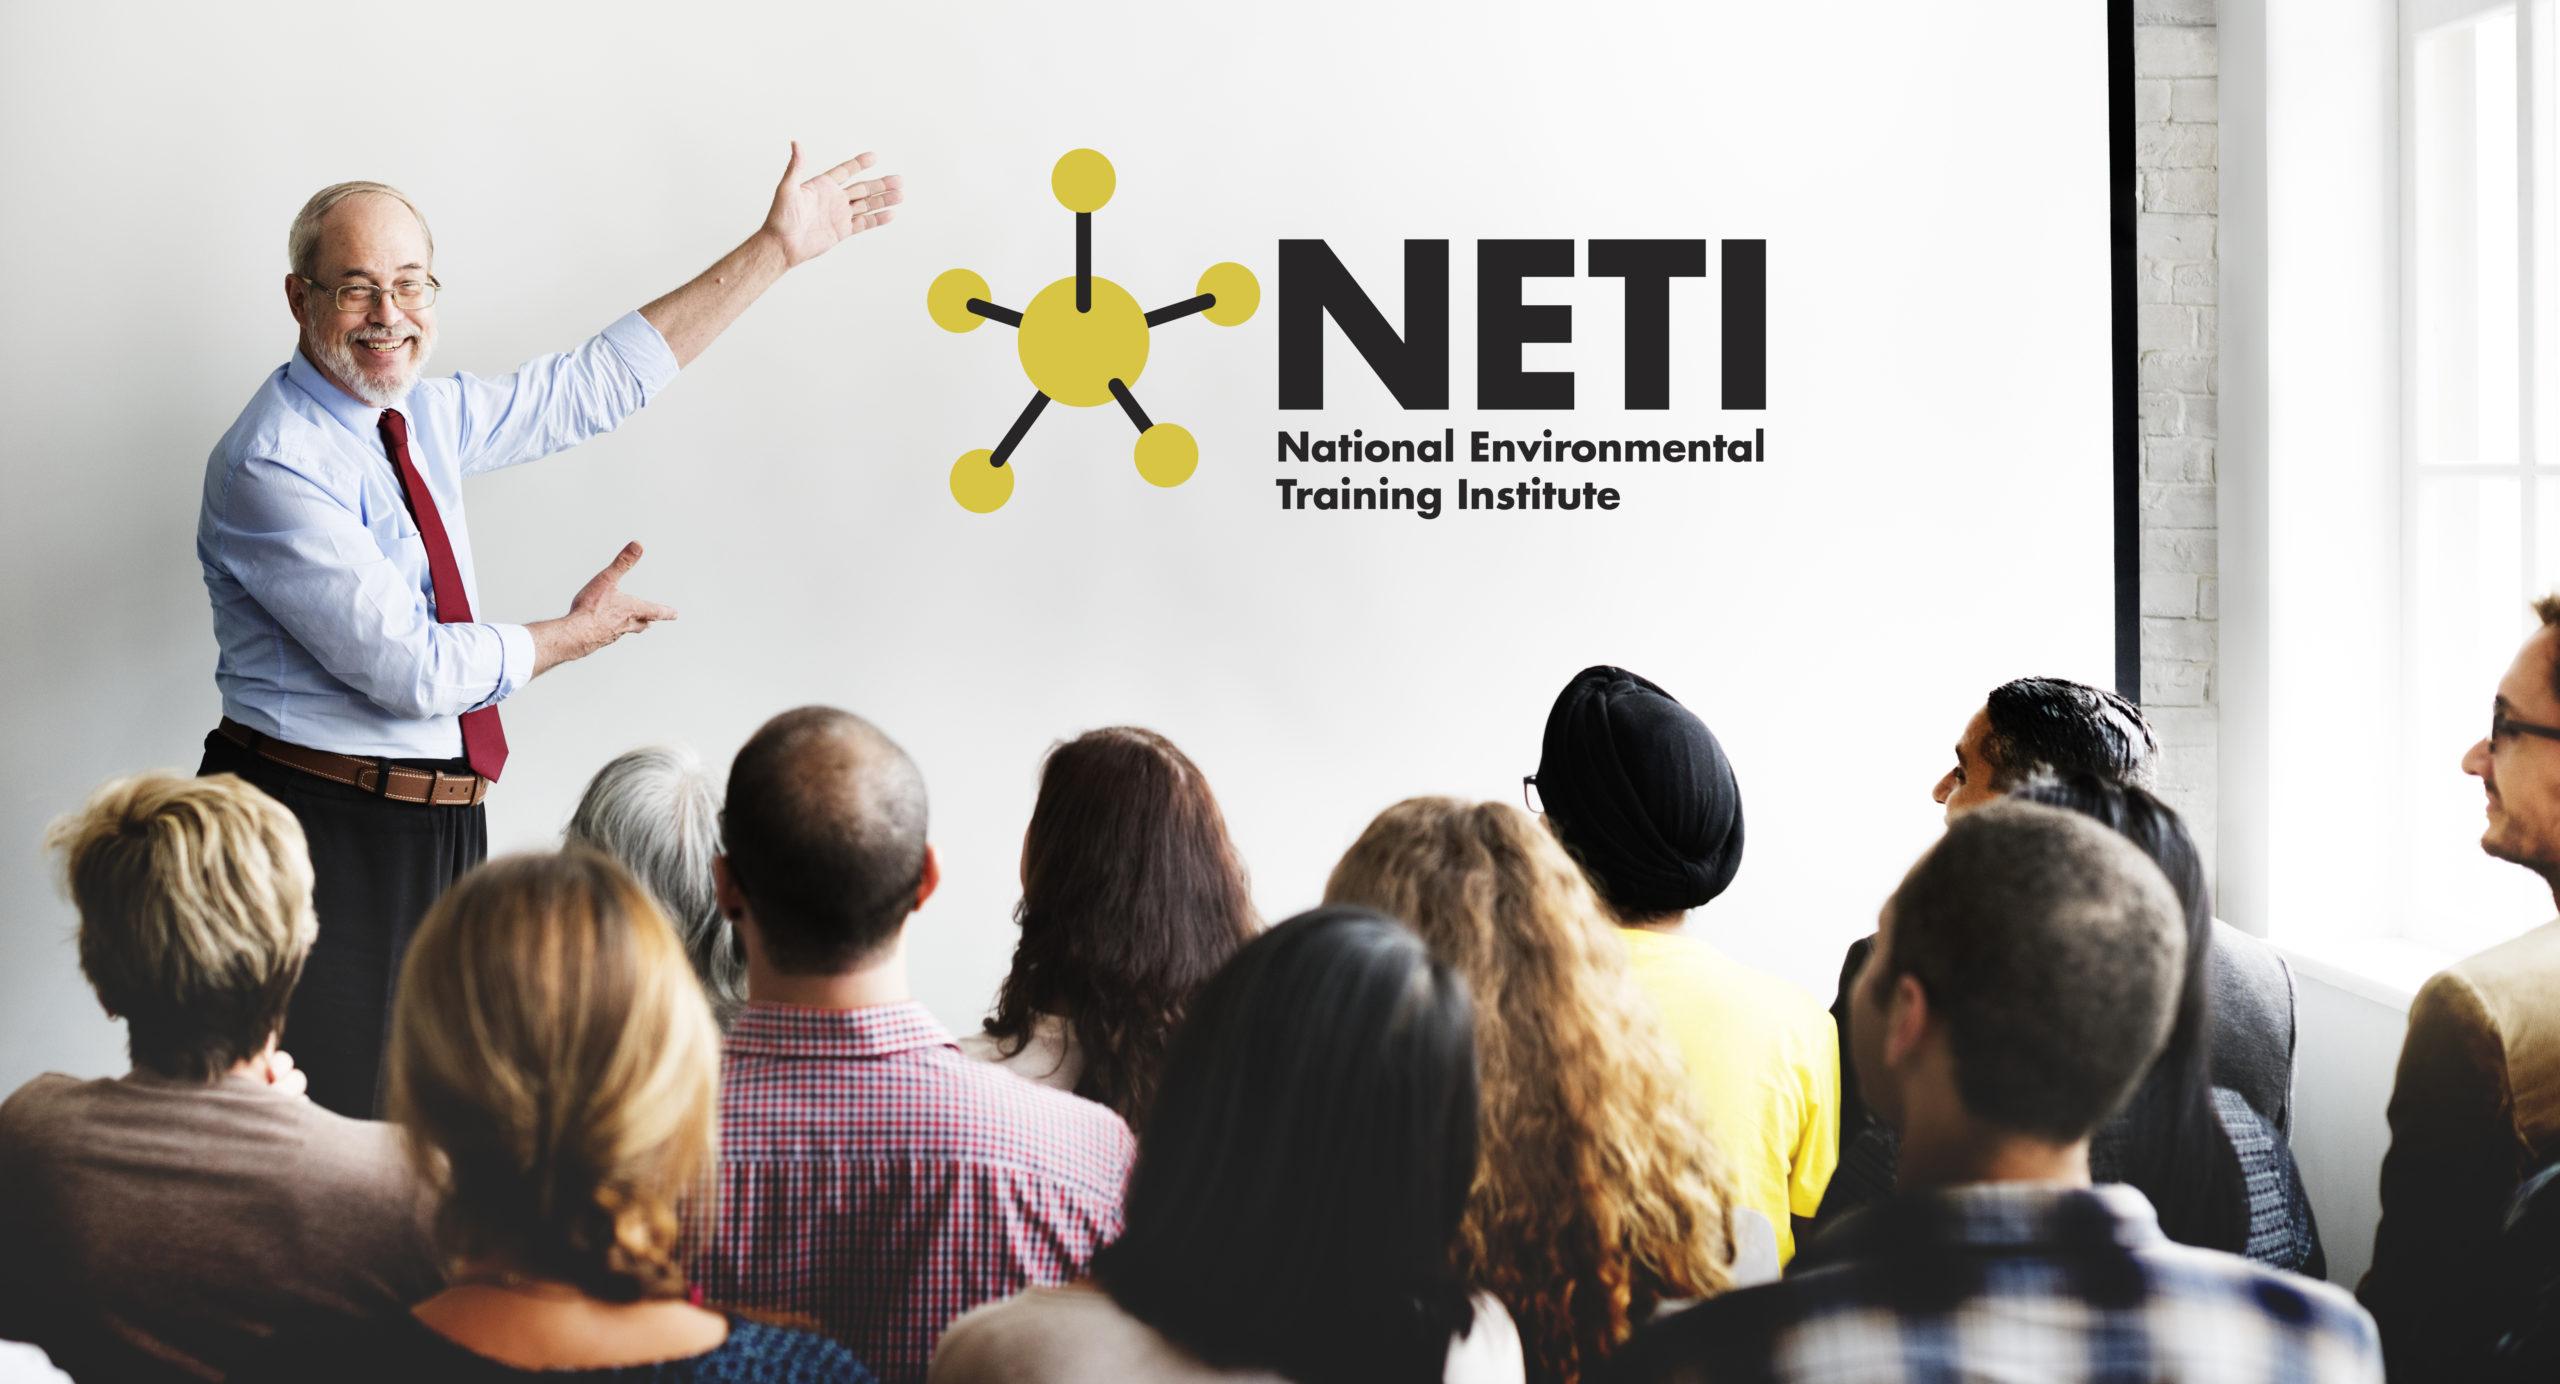 national environmental training